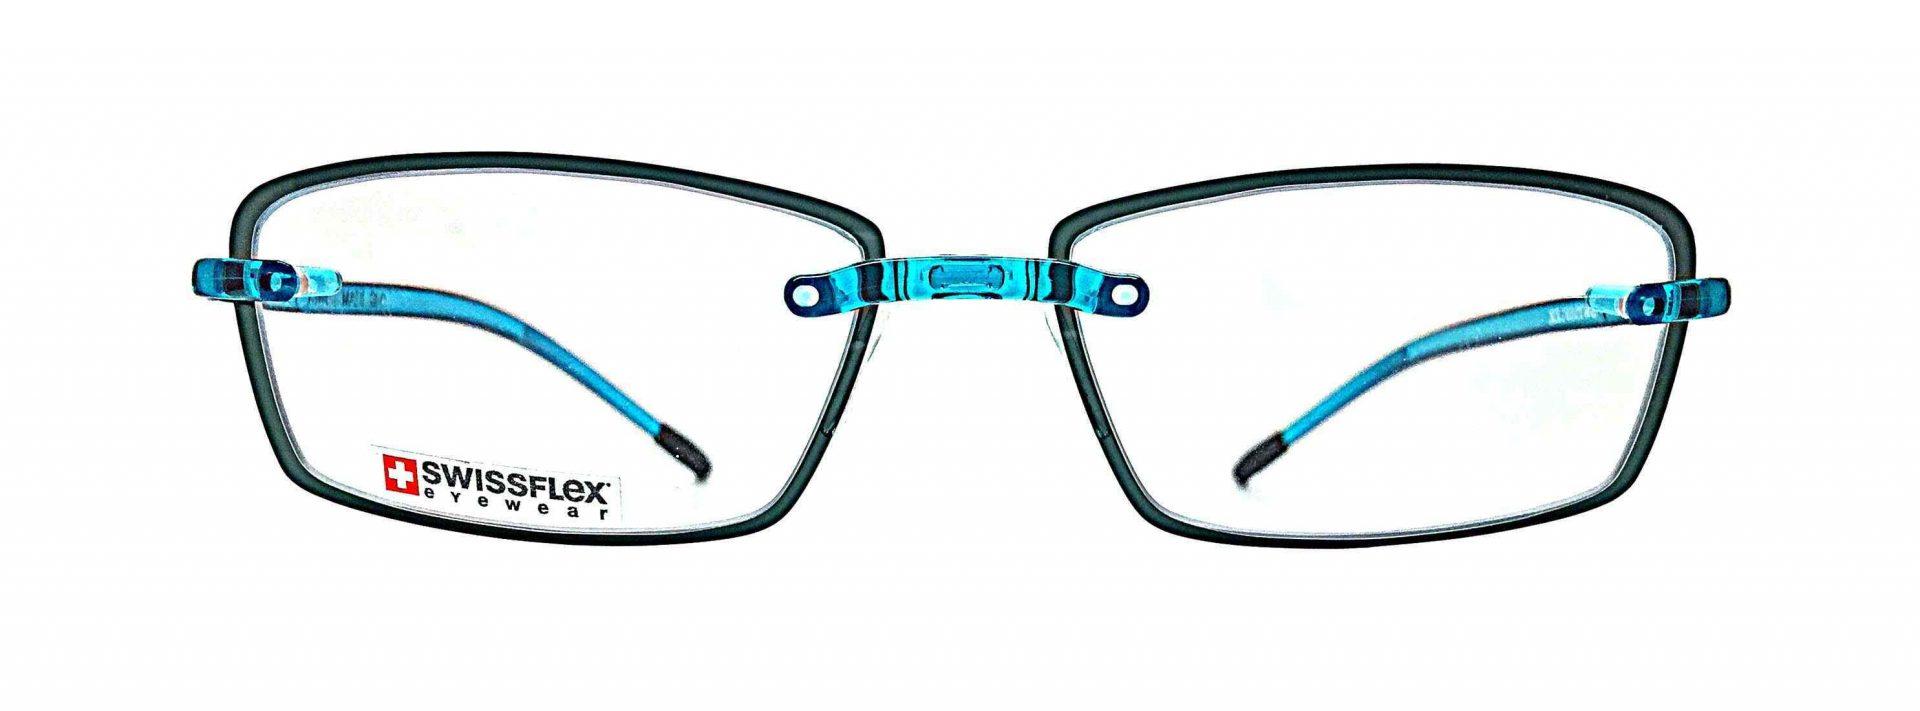 SwissFlex spectacles: SwissFlex Contur 202 54 1 2970x1100